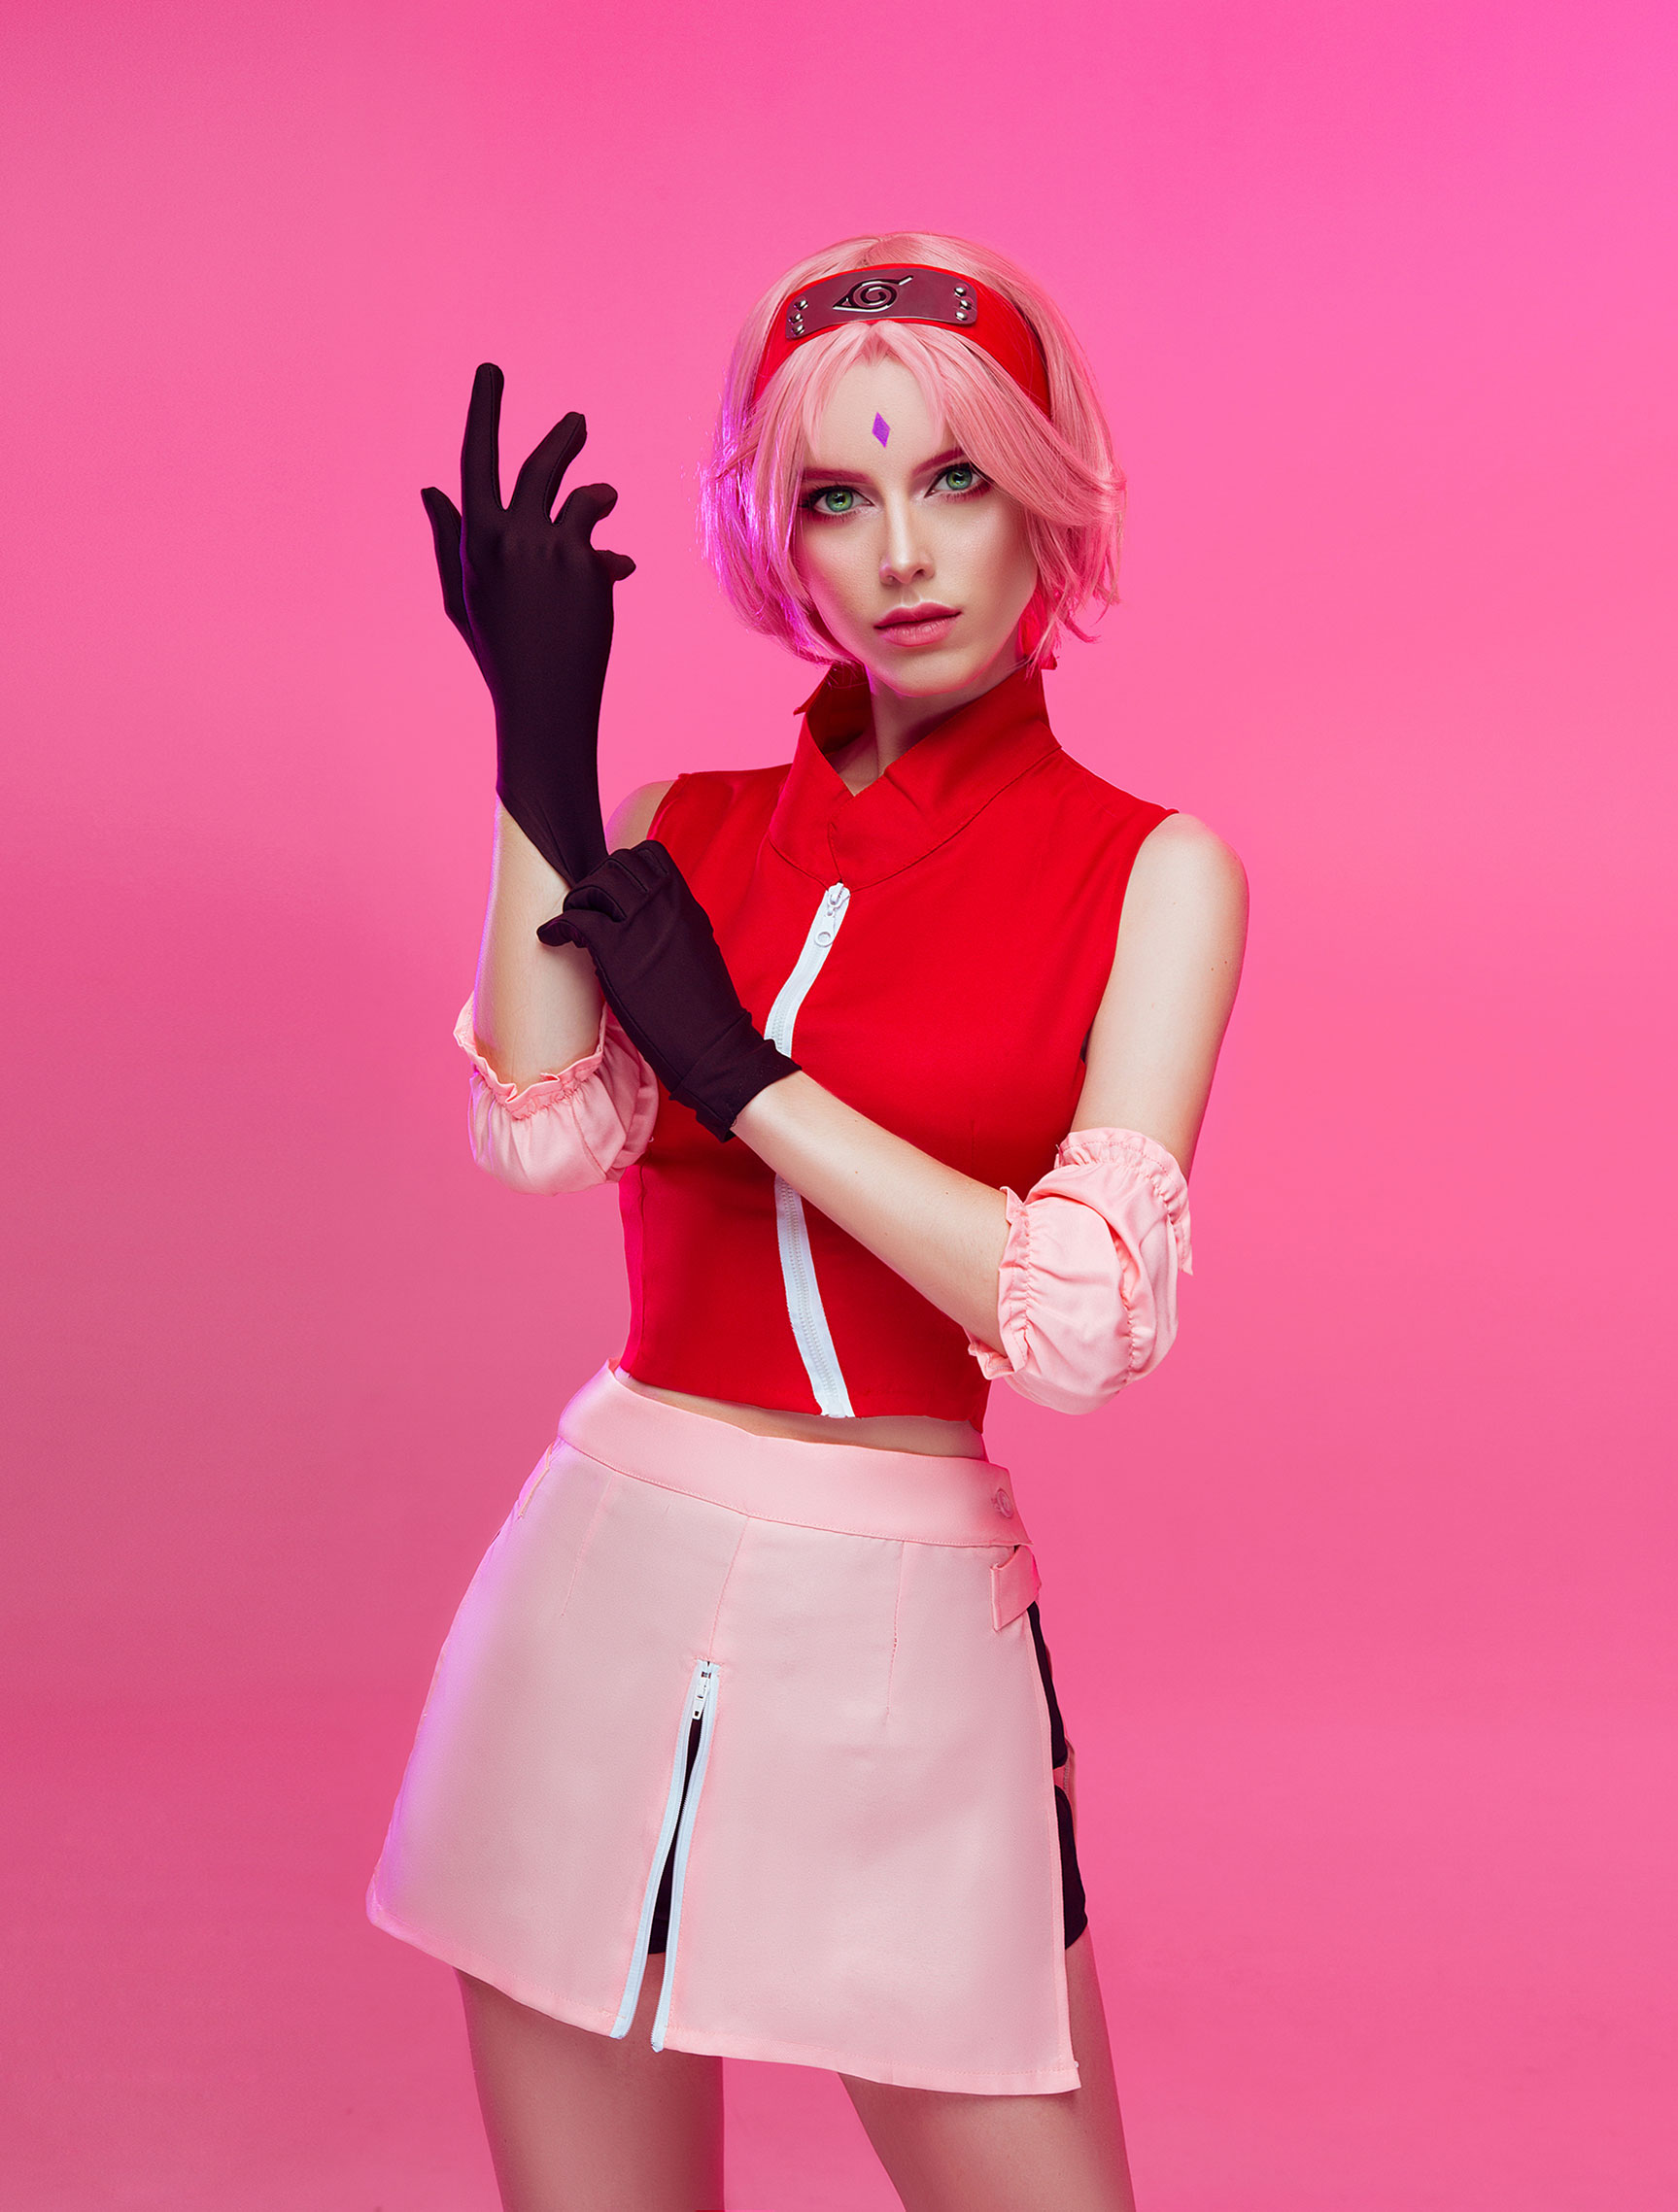 Cosplay / Katie Kosova / Катя Косова в роли Sakura Haruno из аниме Naruto / фотограф Tim Rise